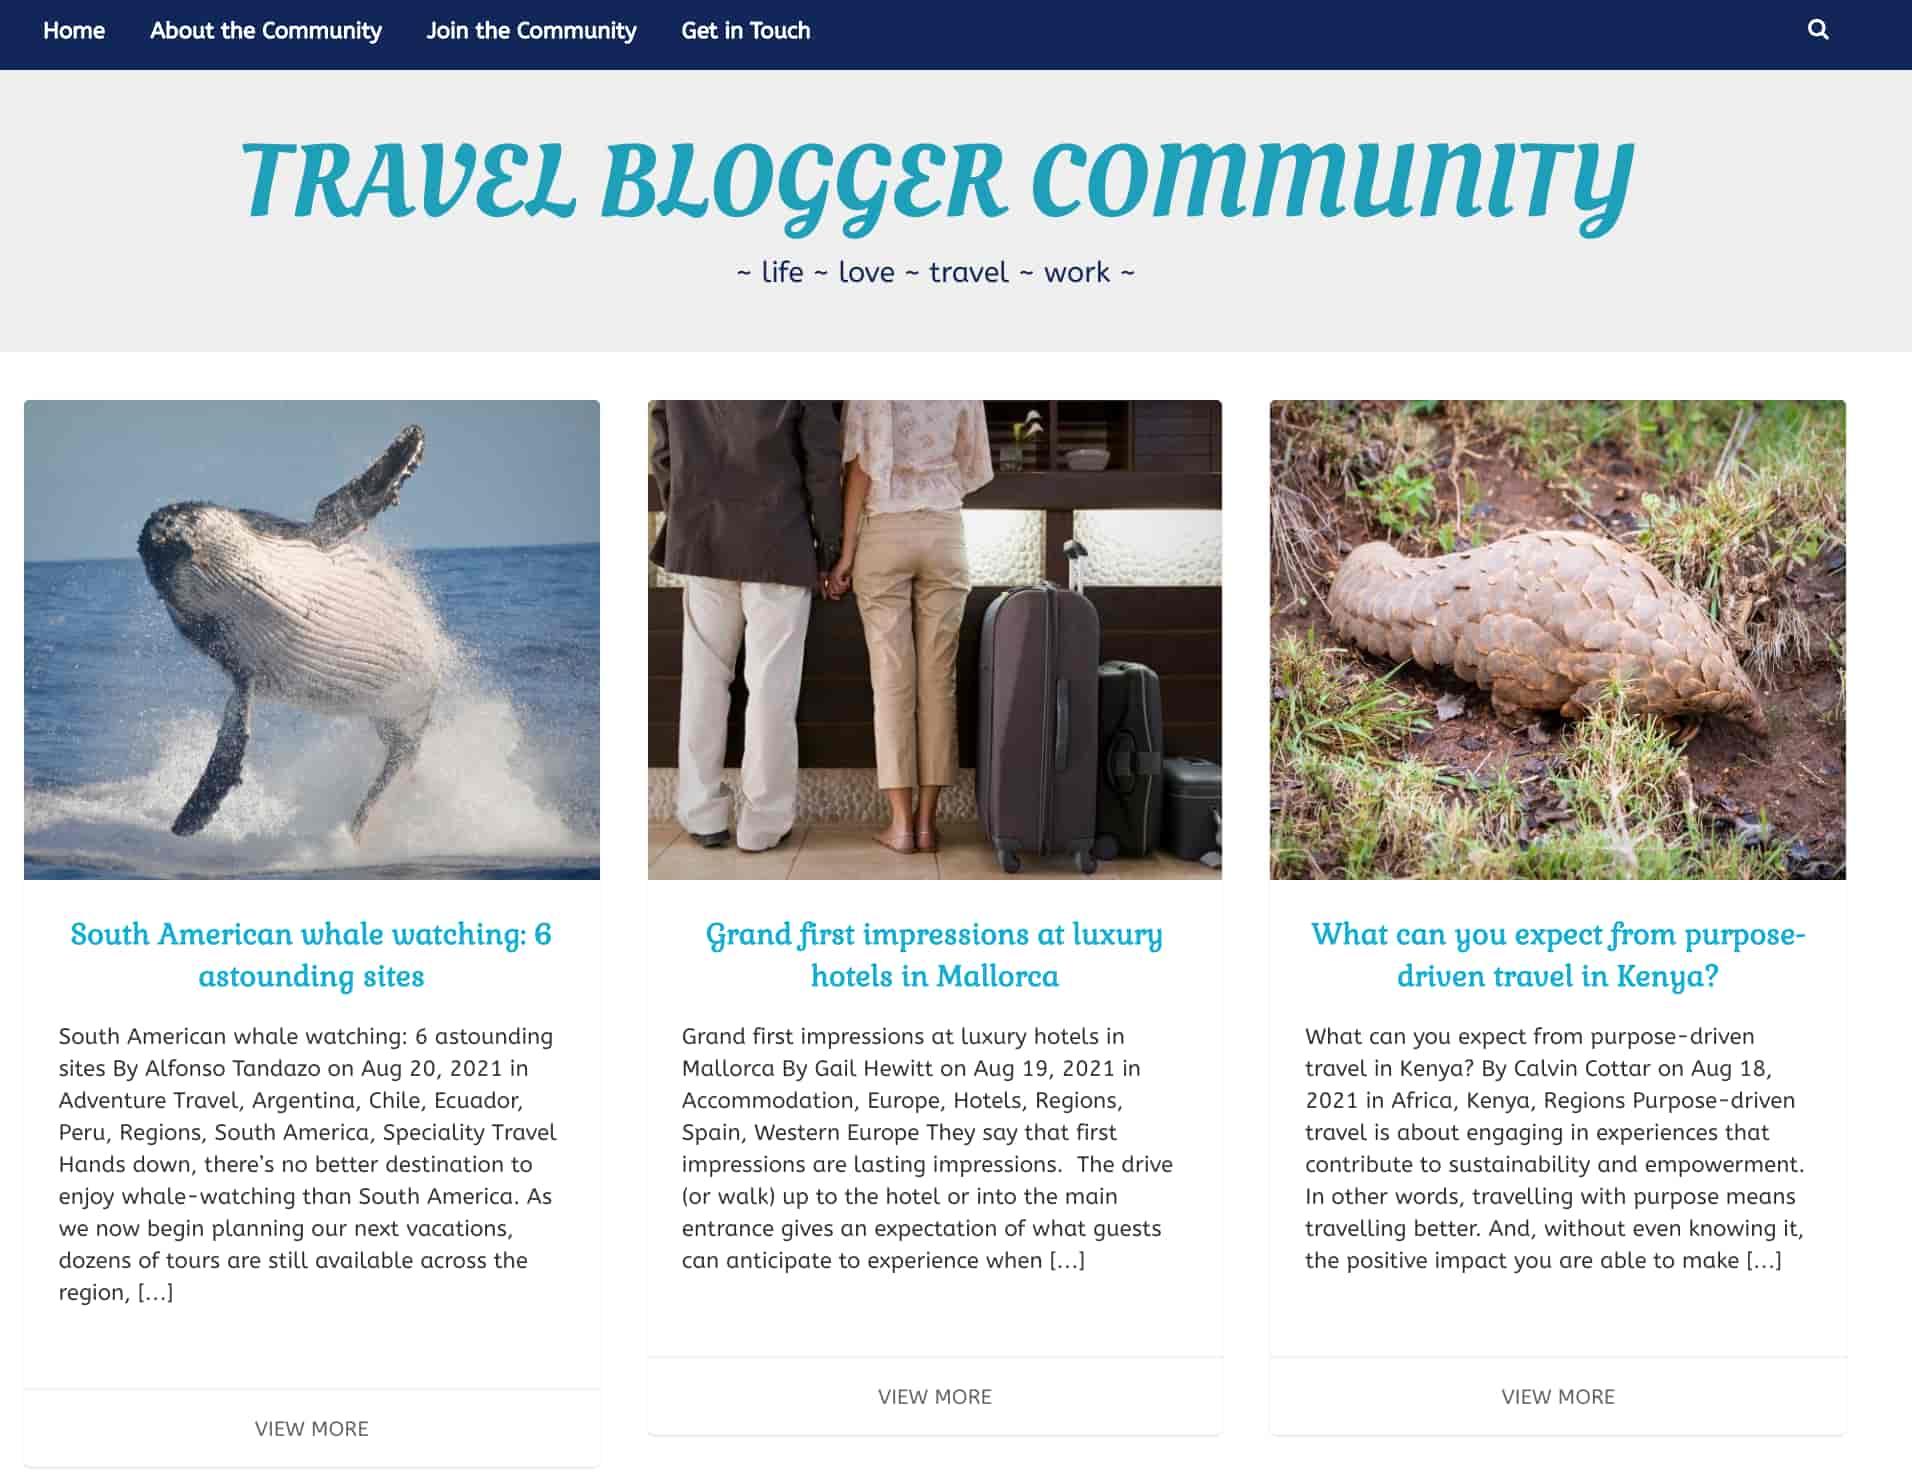 travel blogger community travel blog aggregation site